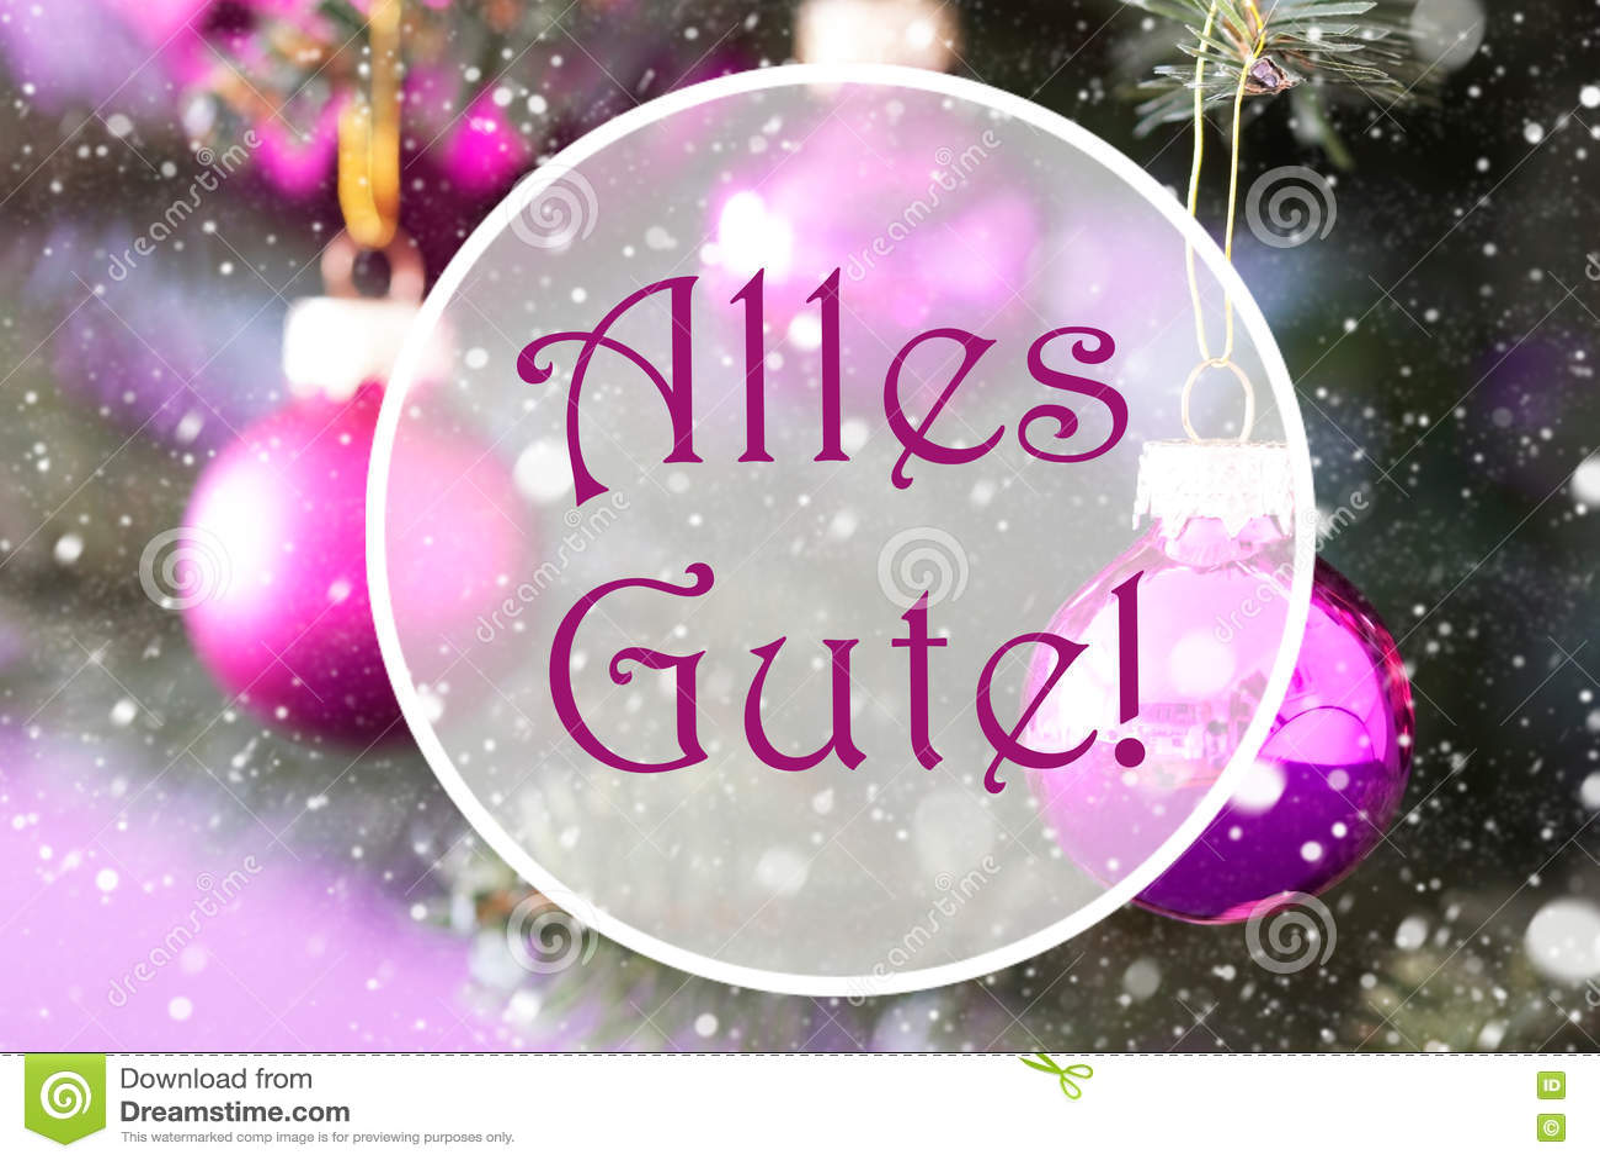 Rose Quartz Christmas Balls Alles Gute Means Best Wishes Stock